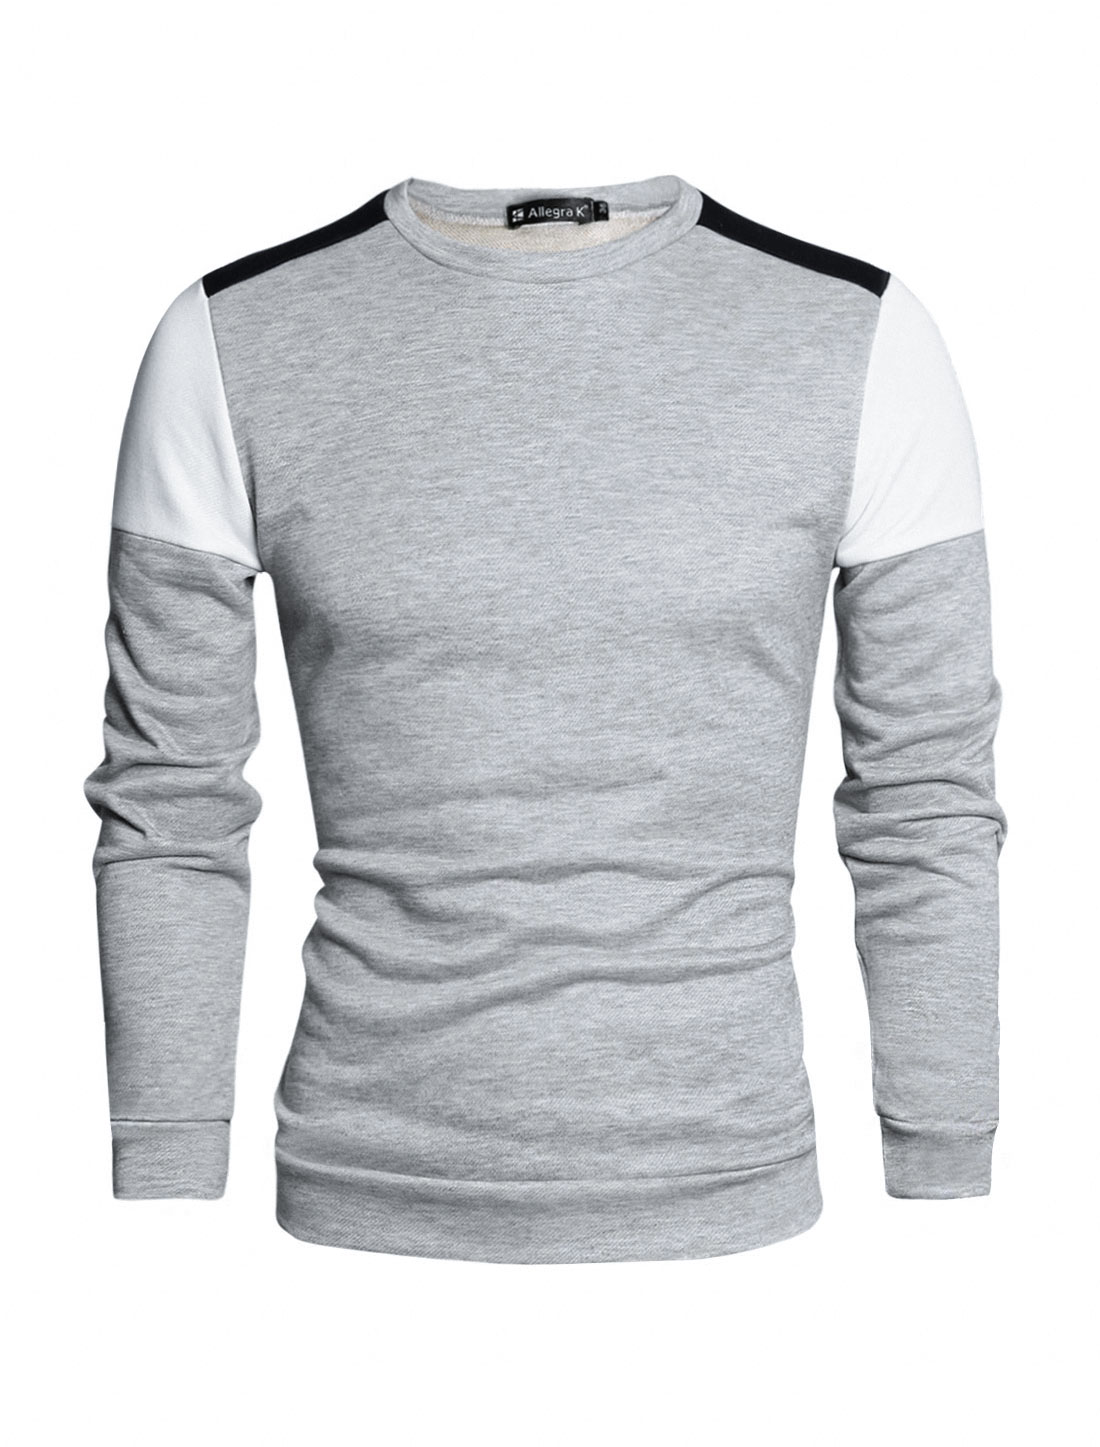 Men Color Block Long Sleeves Panel Design T-shirt Light Gray L